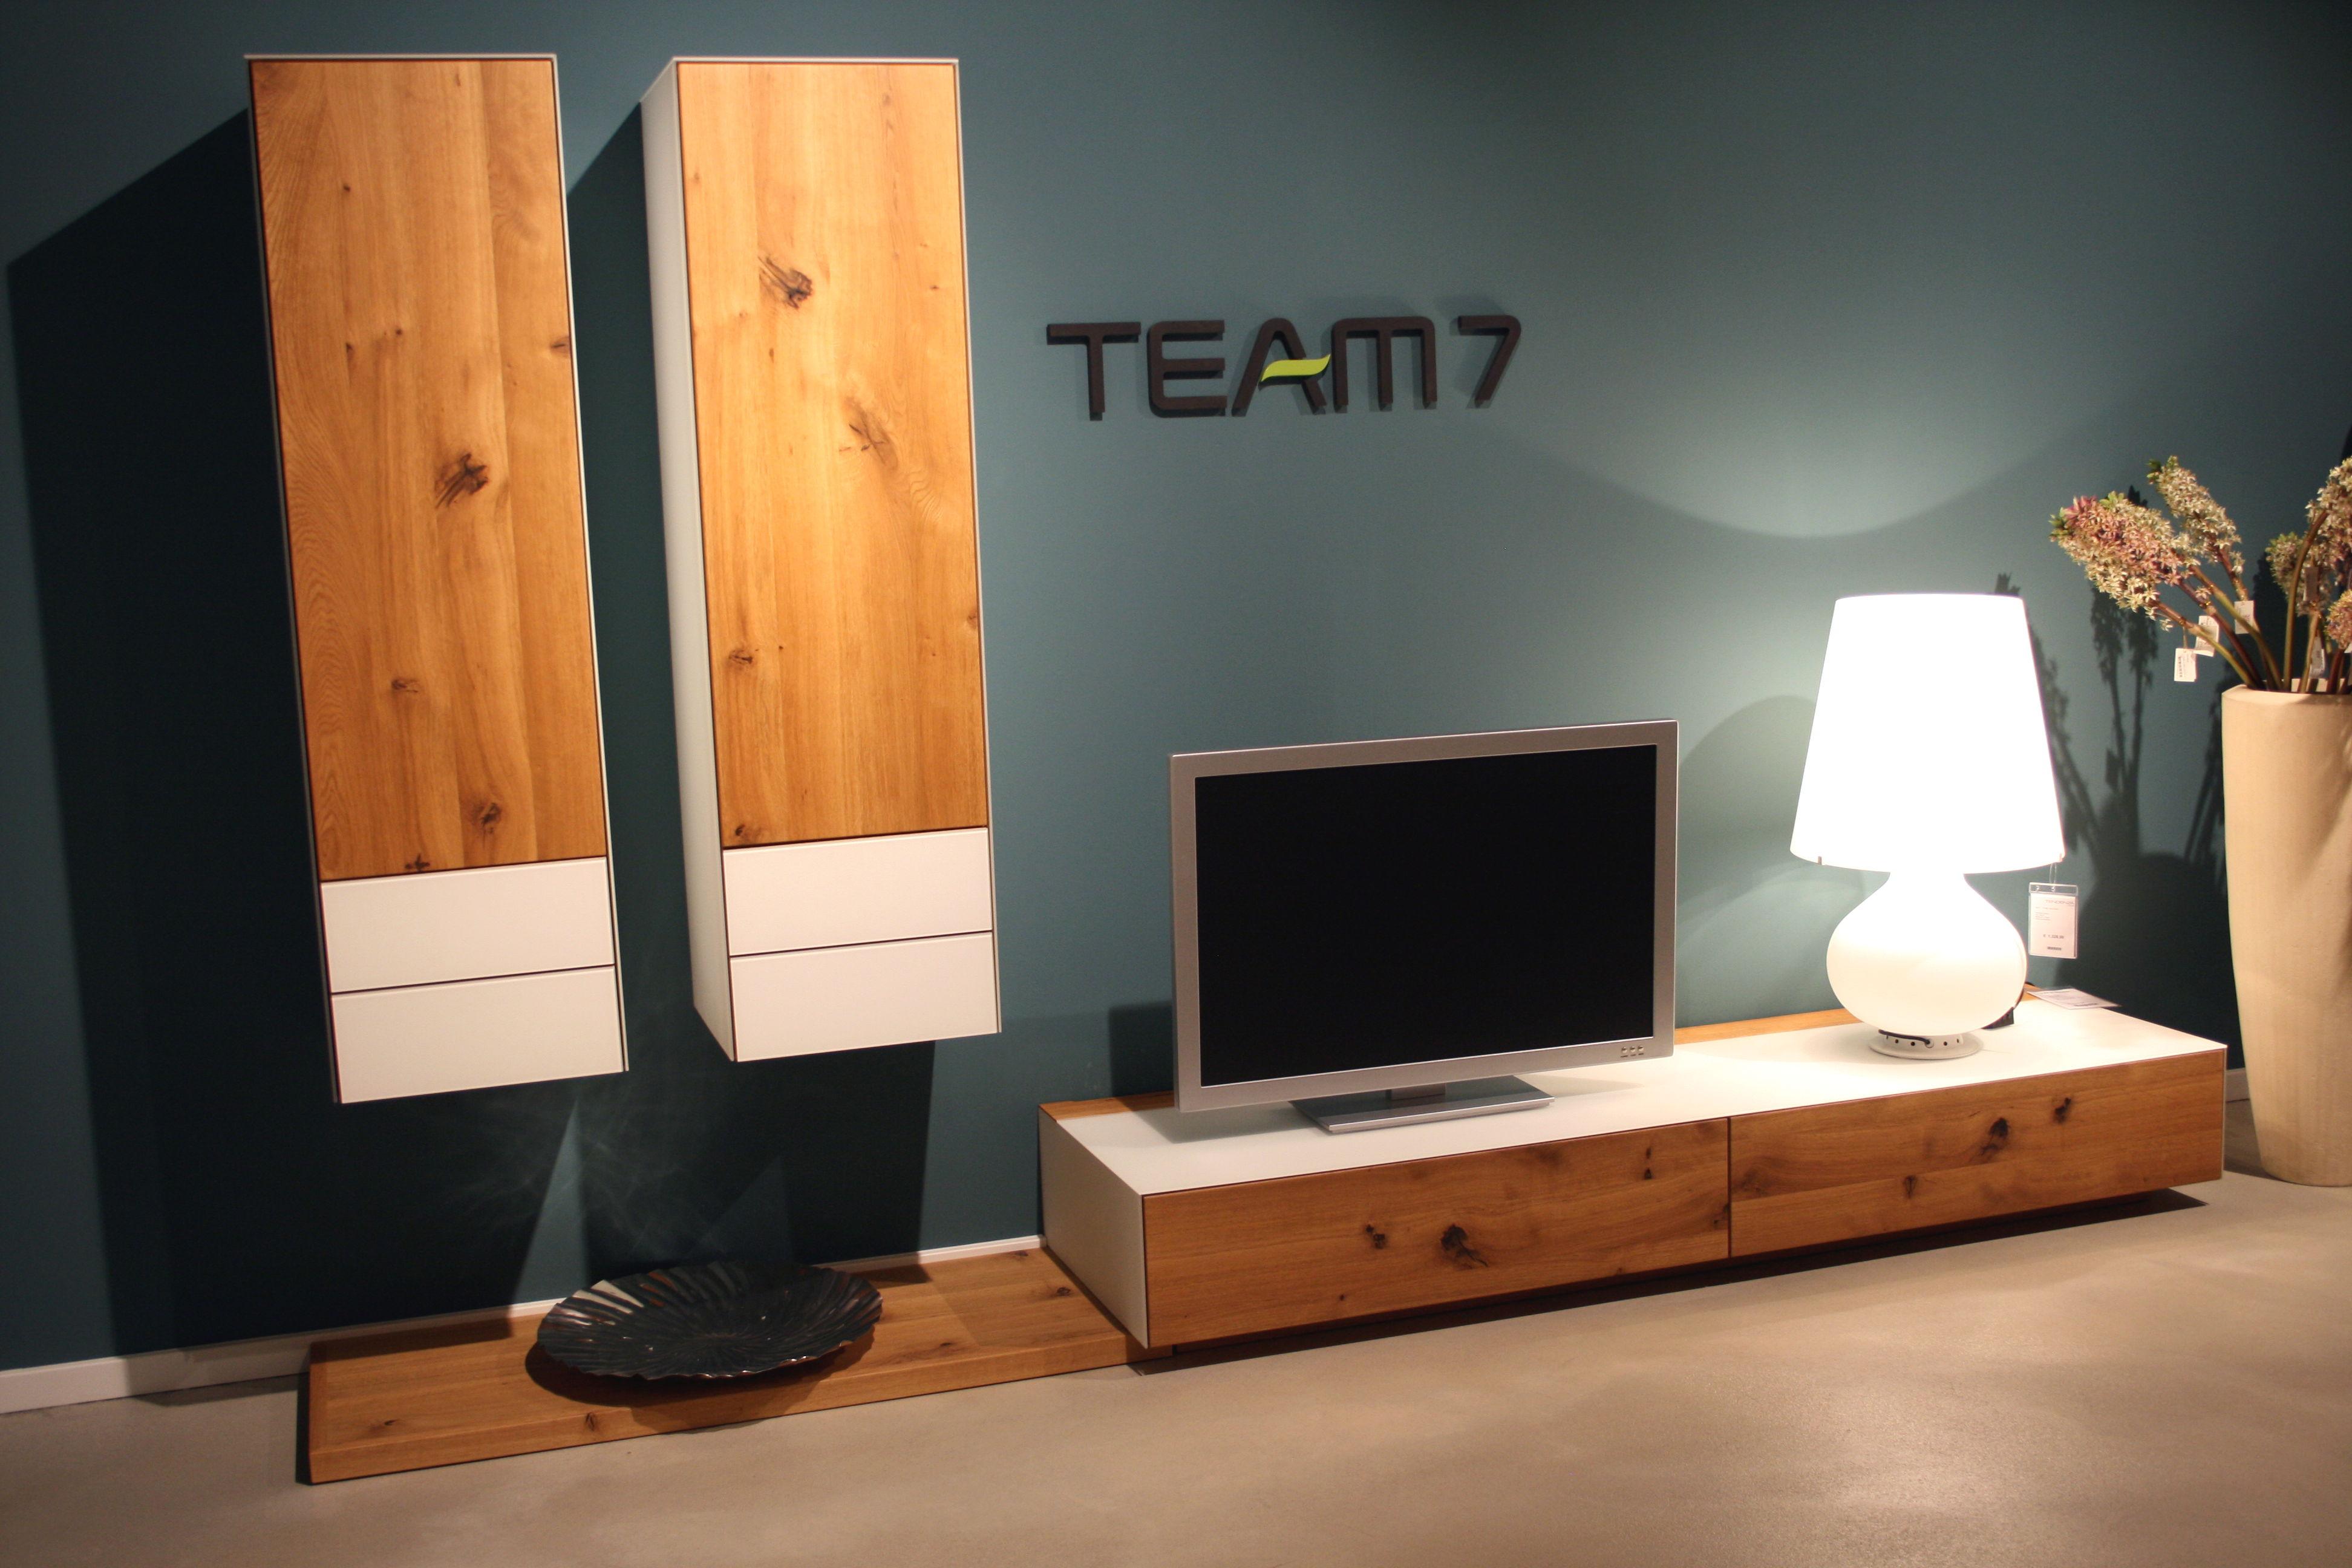 team7 wohnwand cubus pure tendenza. Black Bedroom Furniture Sets. Home Design Ideas